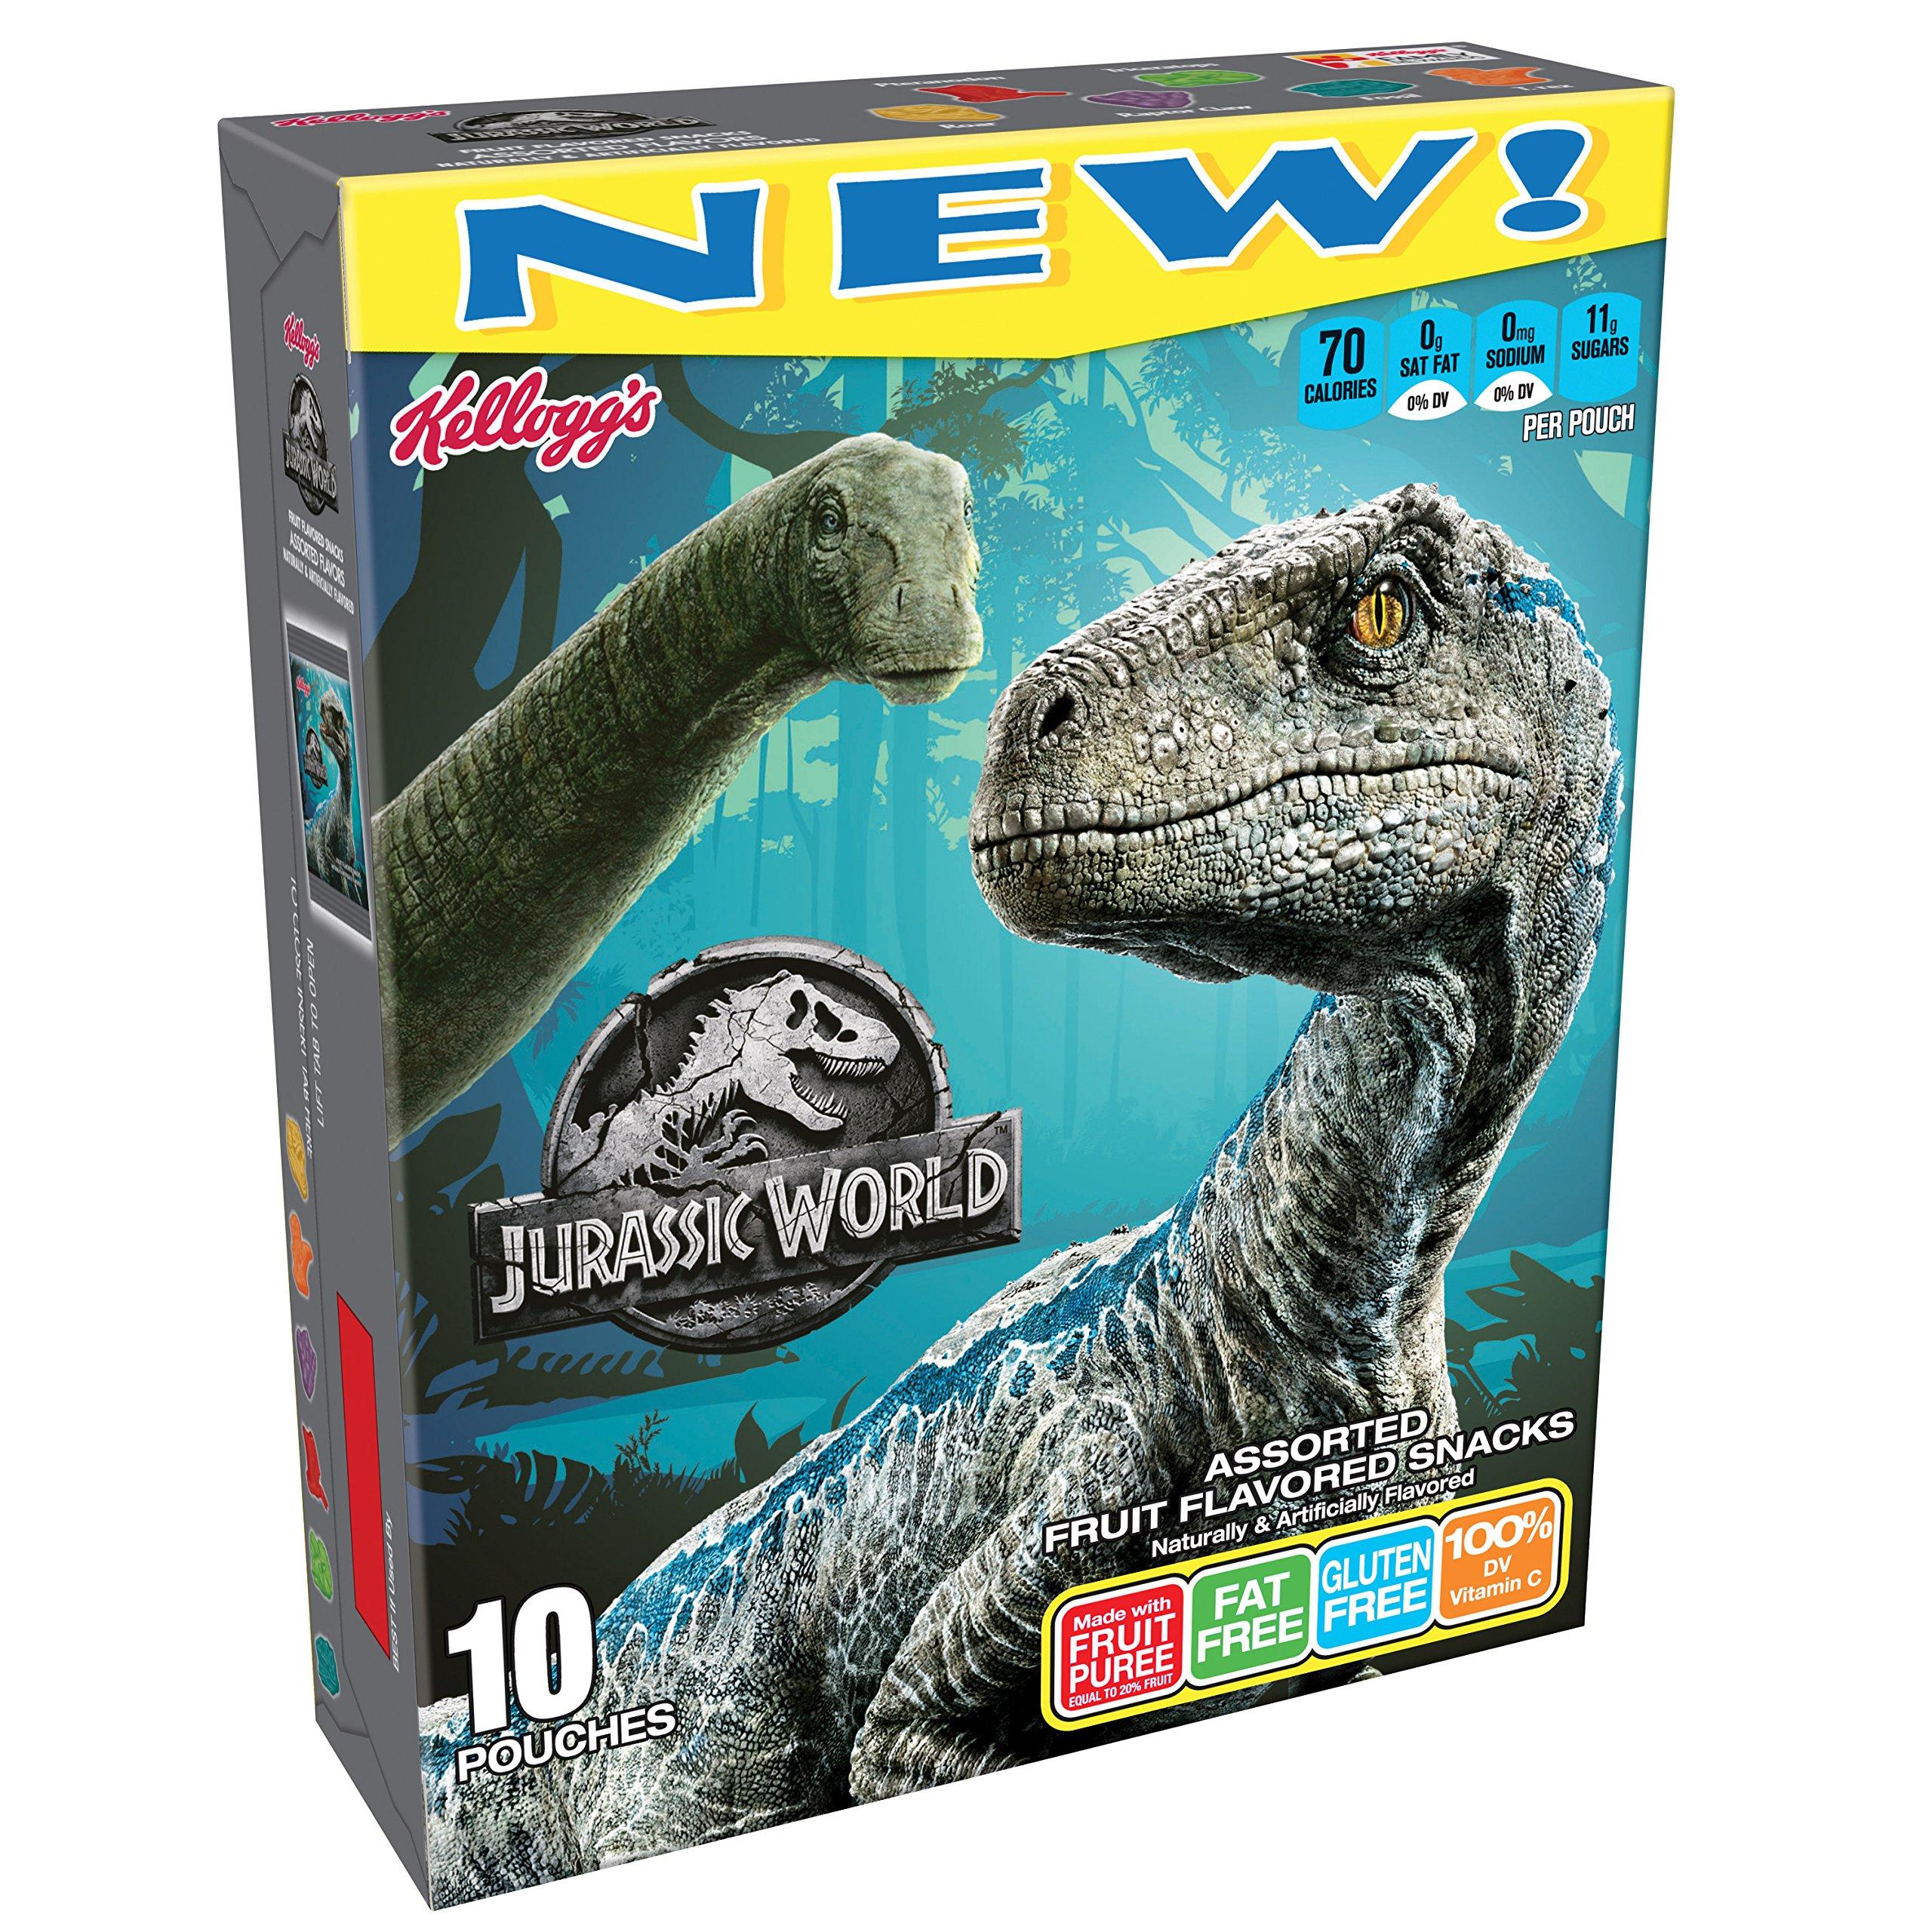 Kellogg's Jurassic World Ii, Fruit Flavored Snacks, 8 Oz, 10 Ct